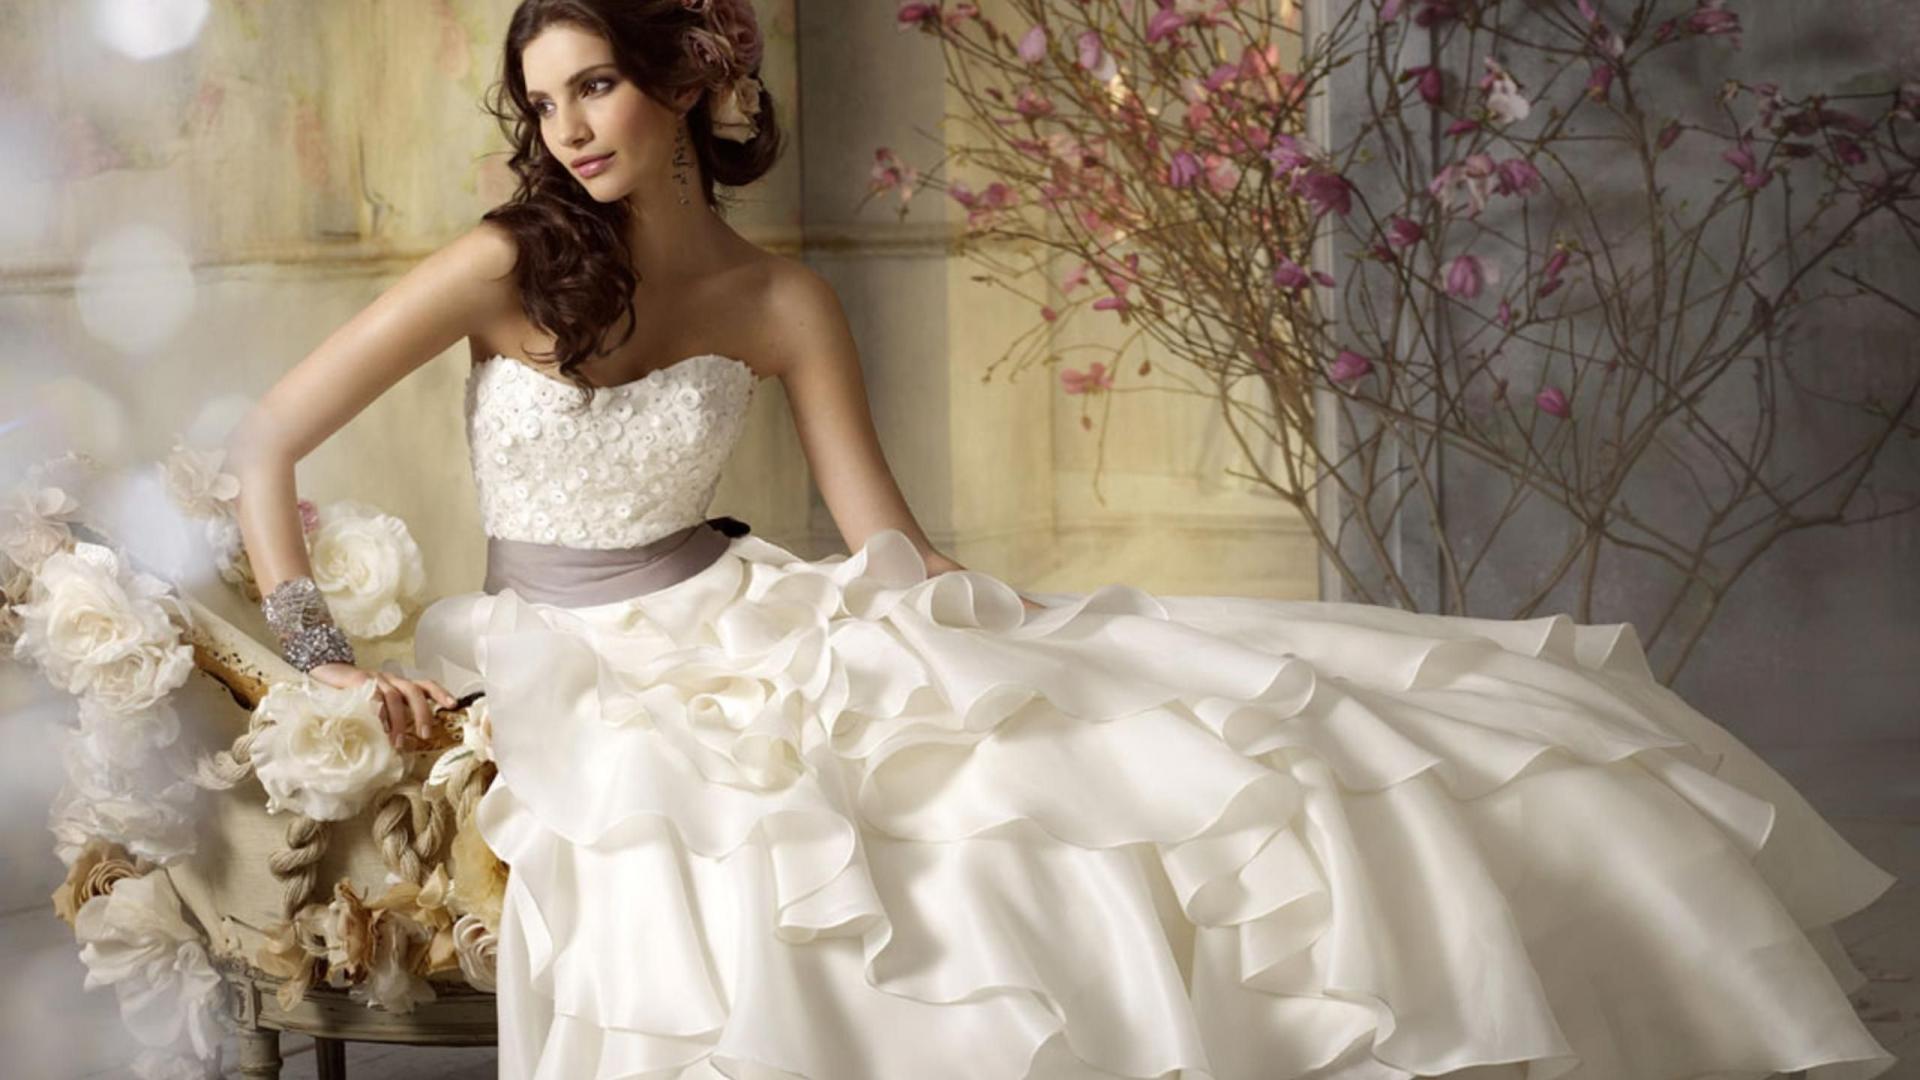 White Wedding Dress For Women Wallpaper U2013 Cathie U0027s Creative